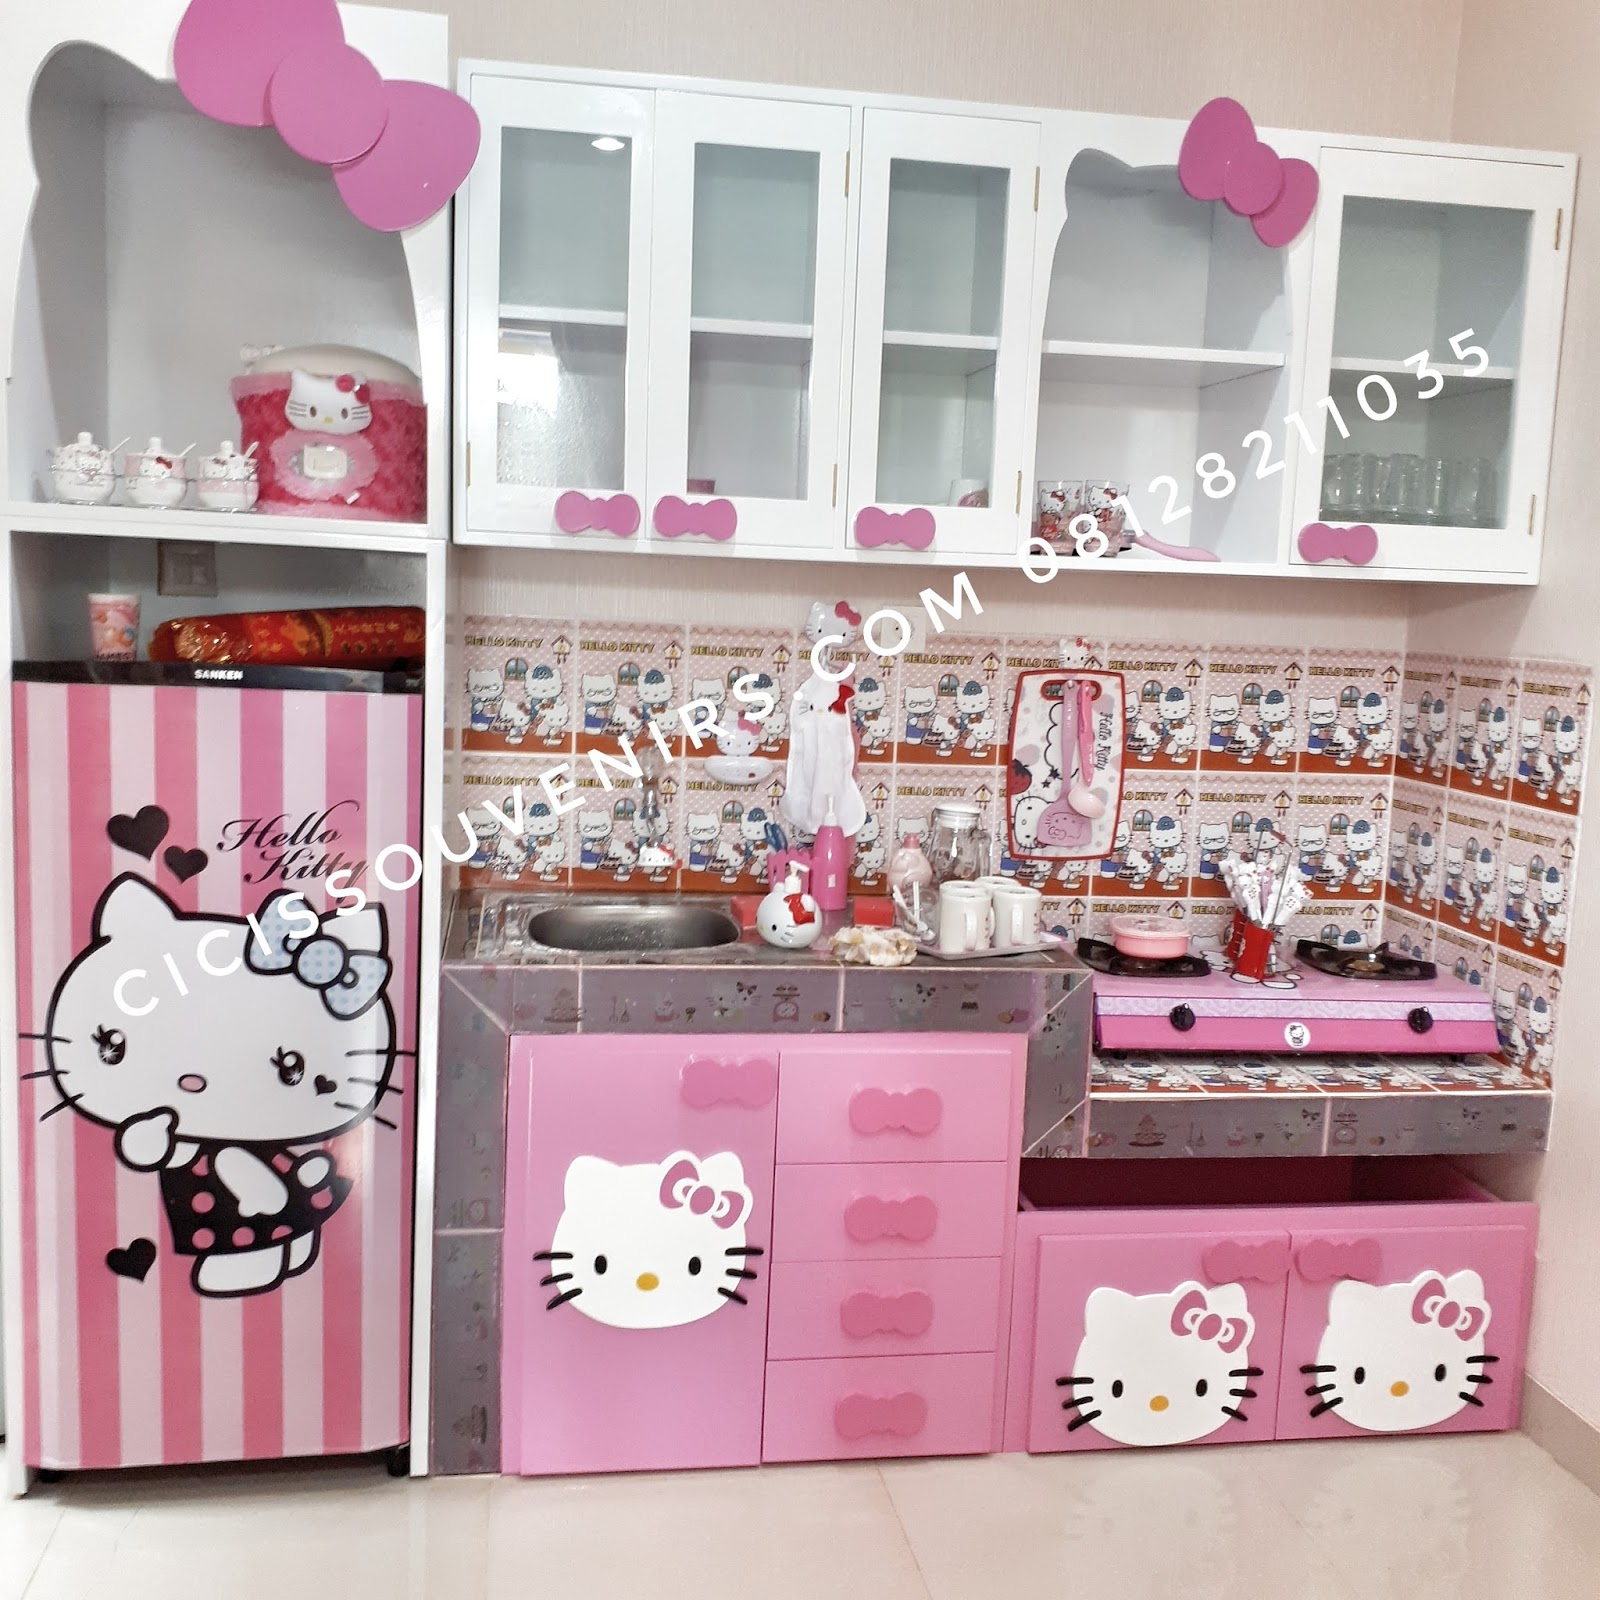 Hello Kitty Wooden Kitchen Set: Www.cicissouvenirs.com: Kitchen Set, Meja Makan, Kursi